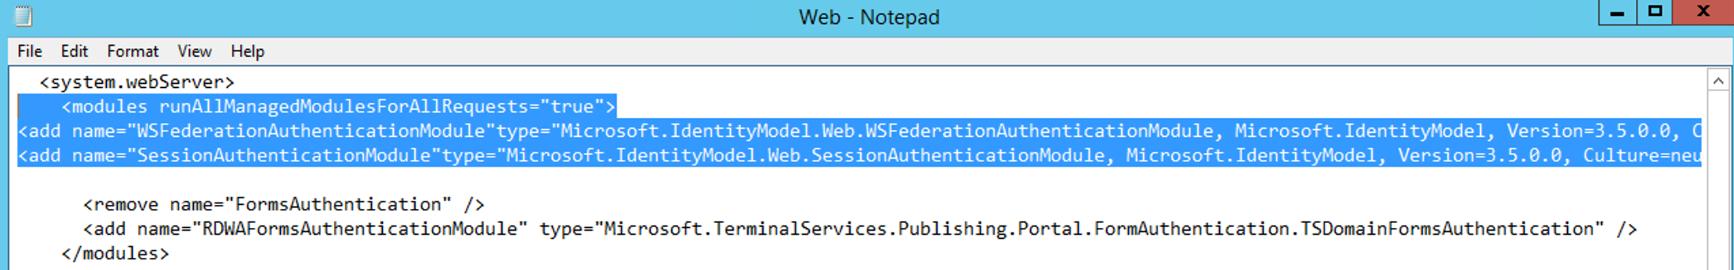 edit-web-config-file4